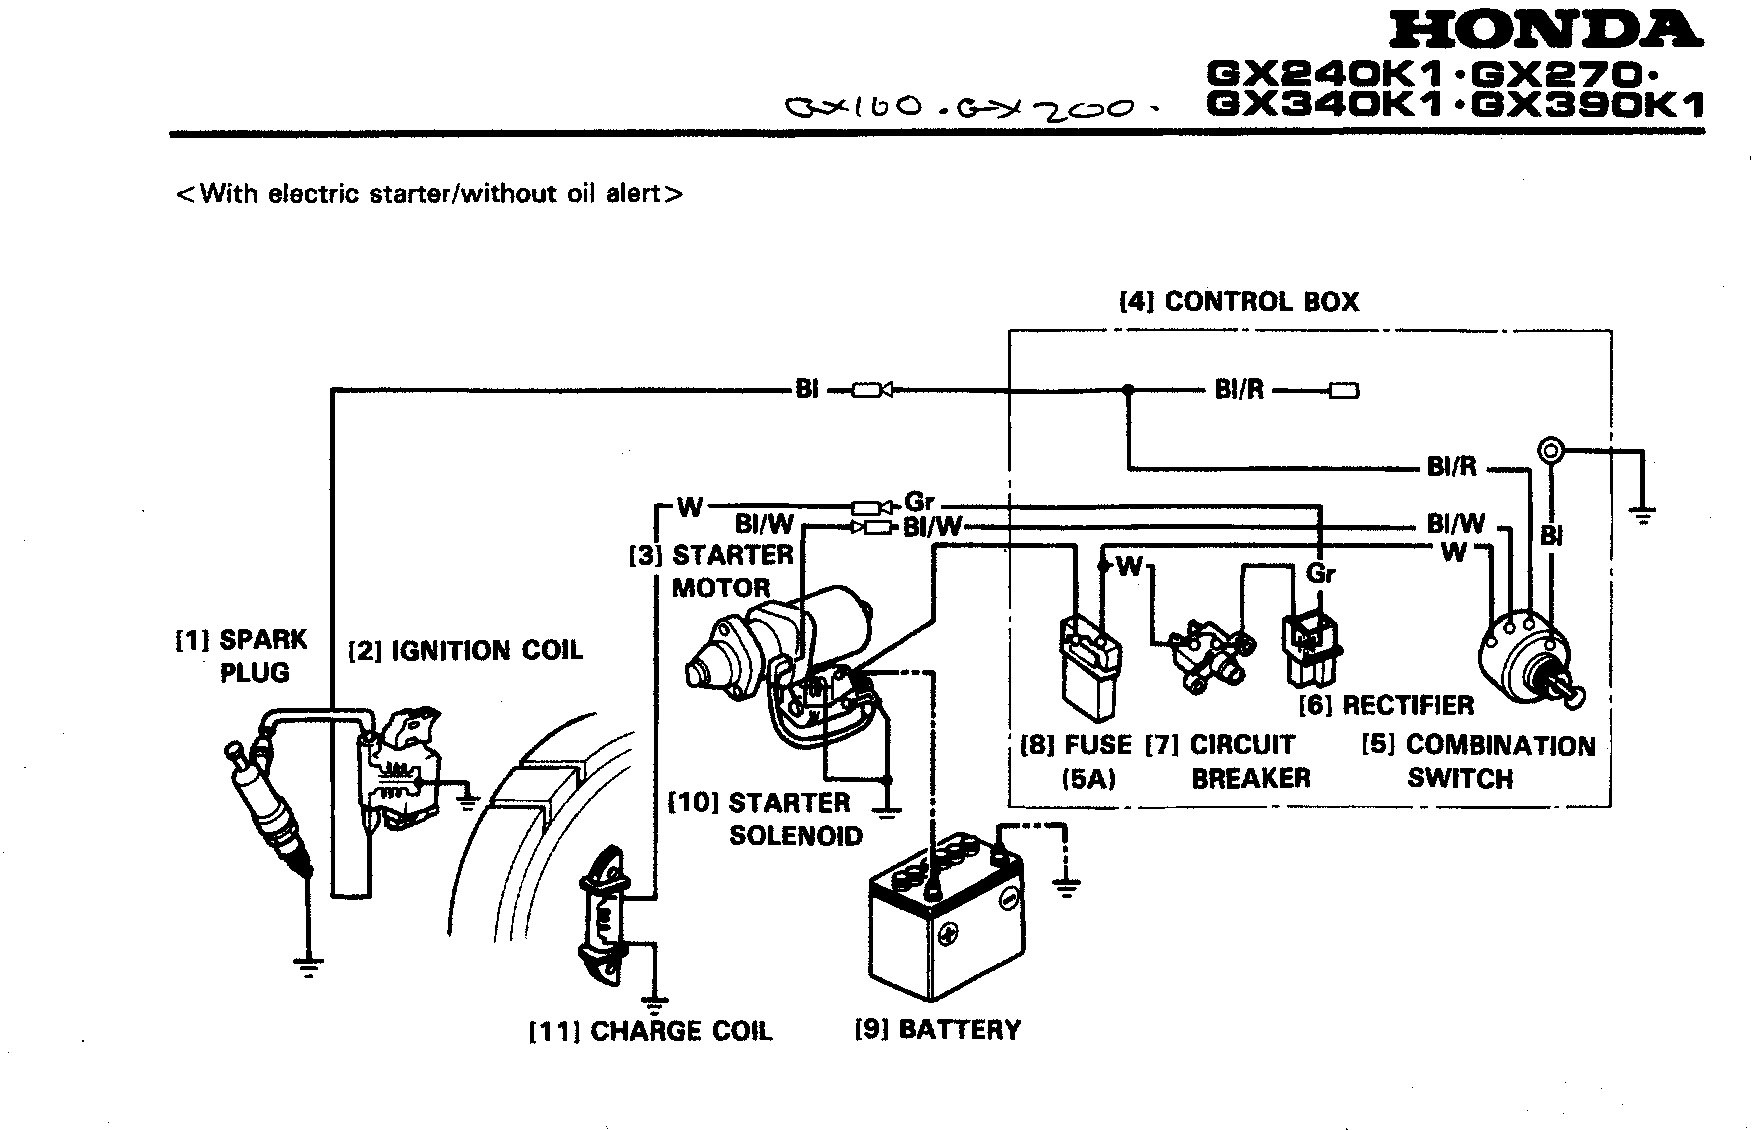 John Deere Stx38 Pto Clutch Wiring Diagram John Circuit Diagrams